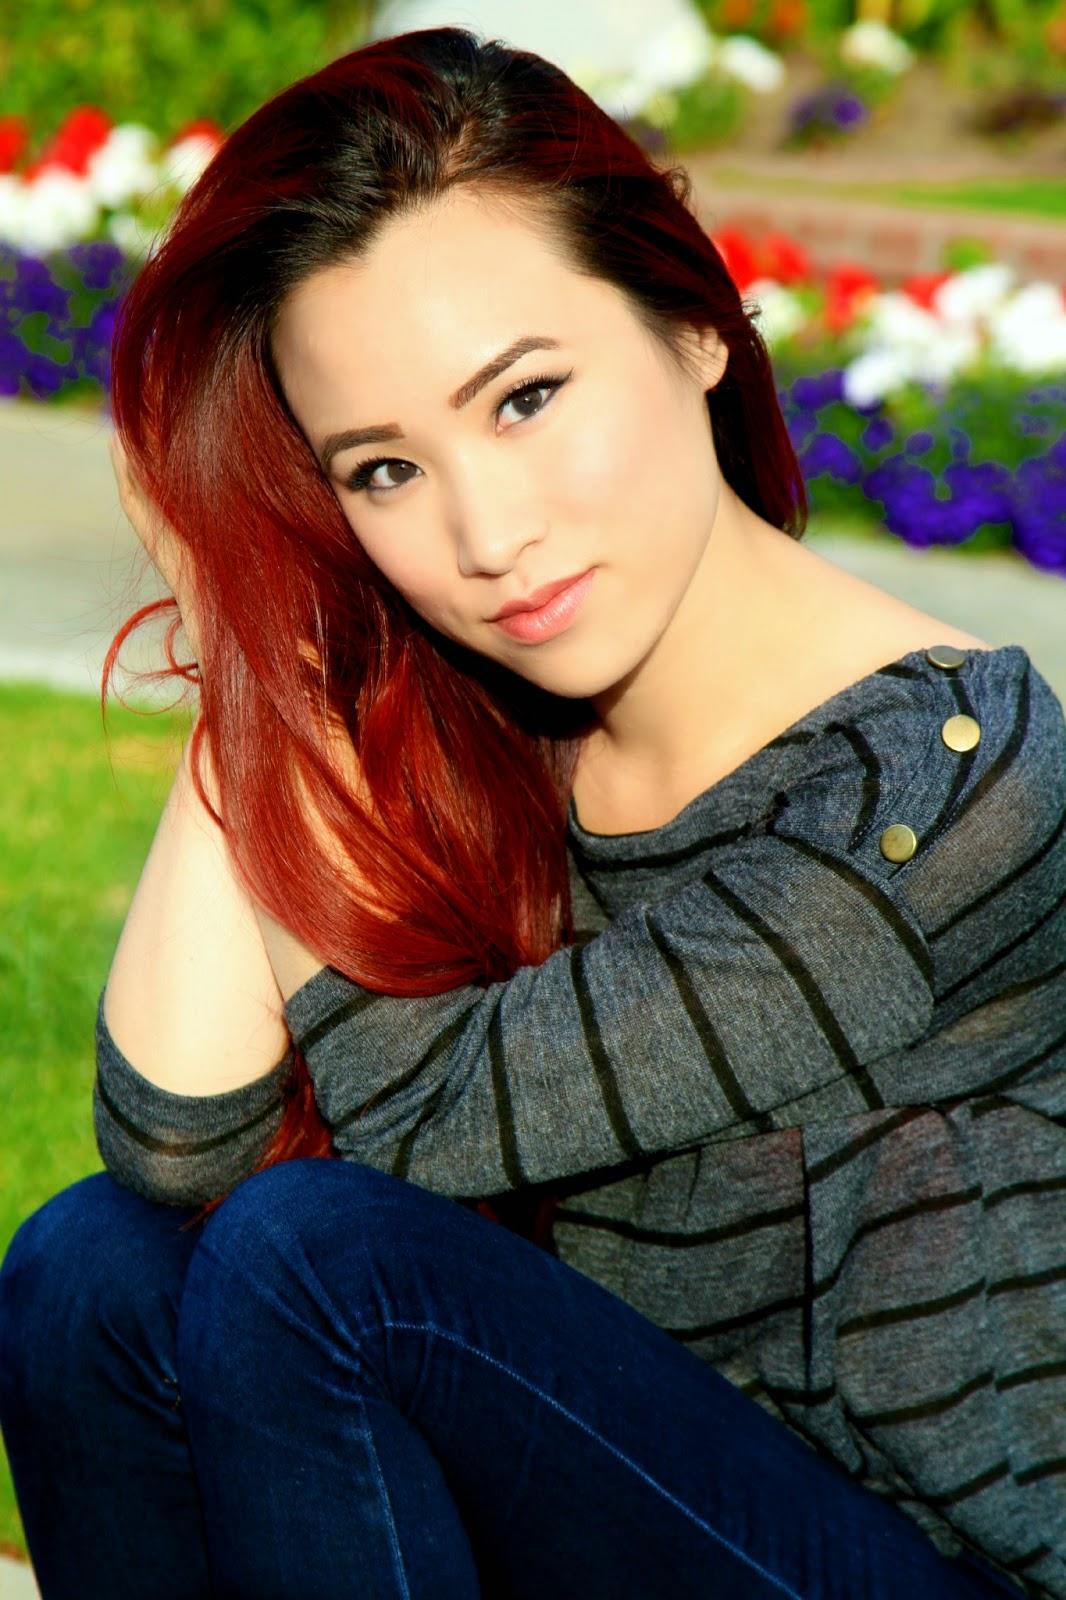 red hair girl wearing false lashes